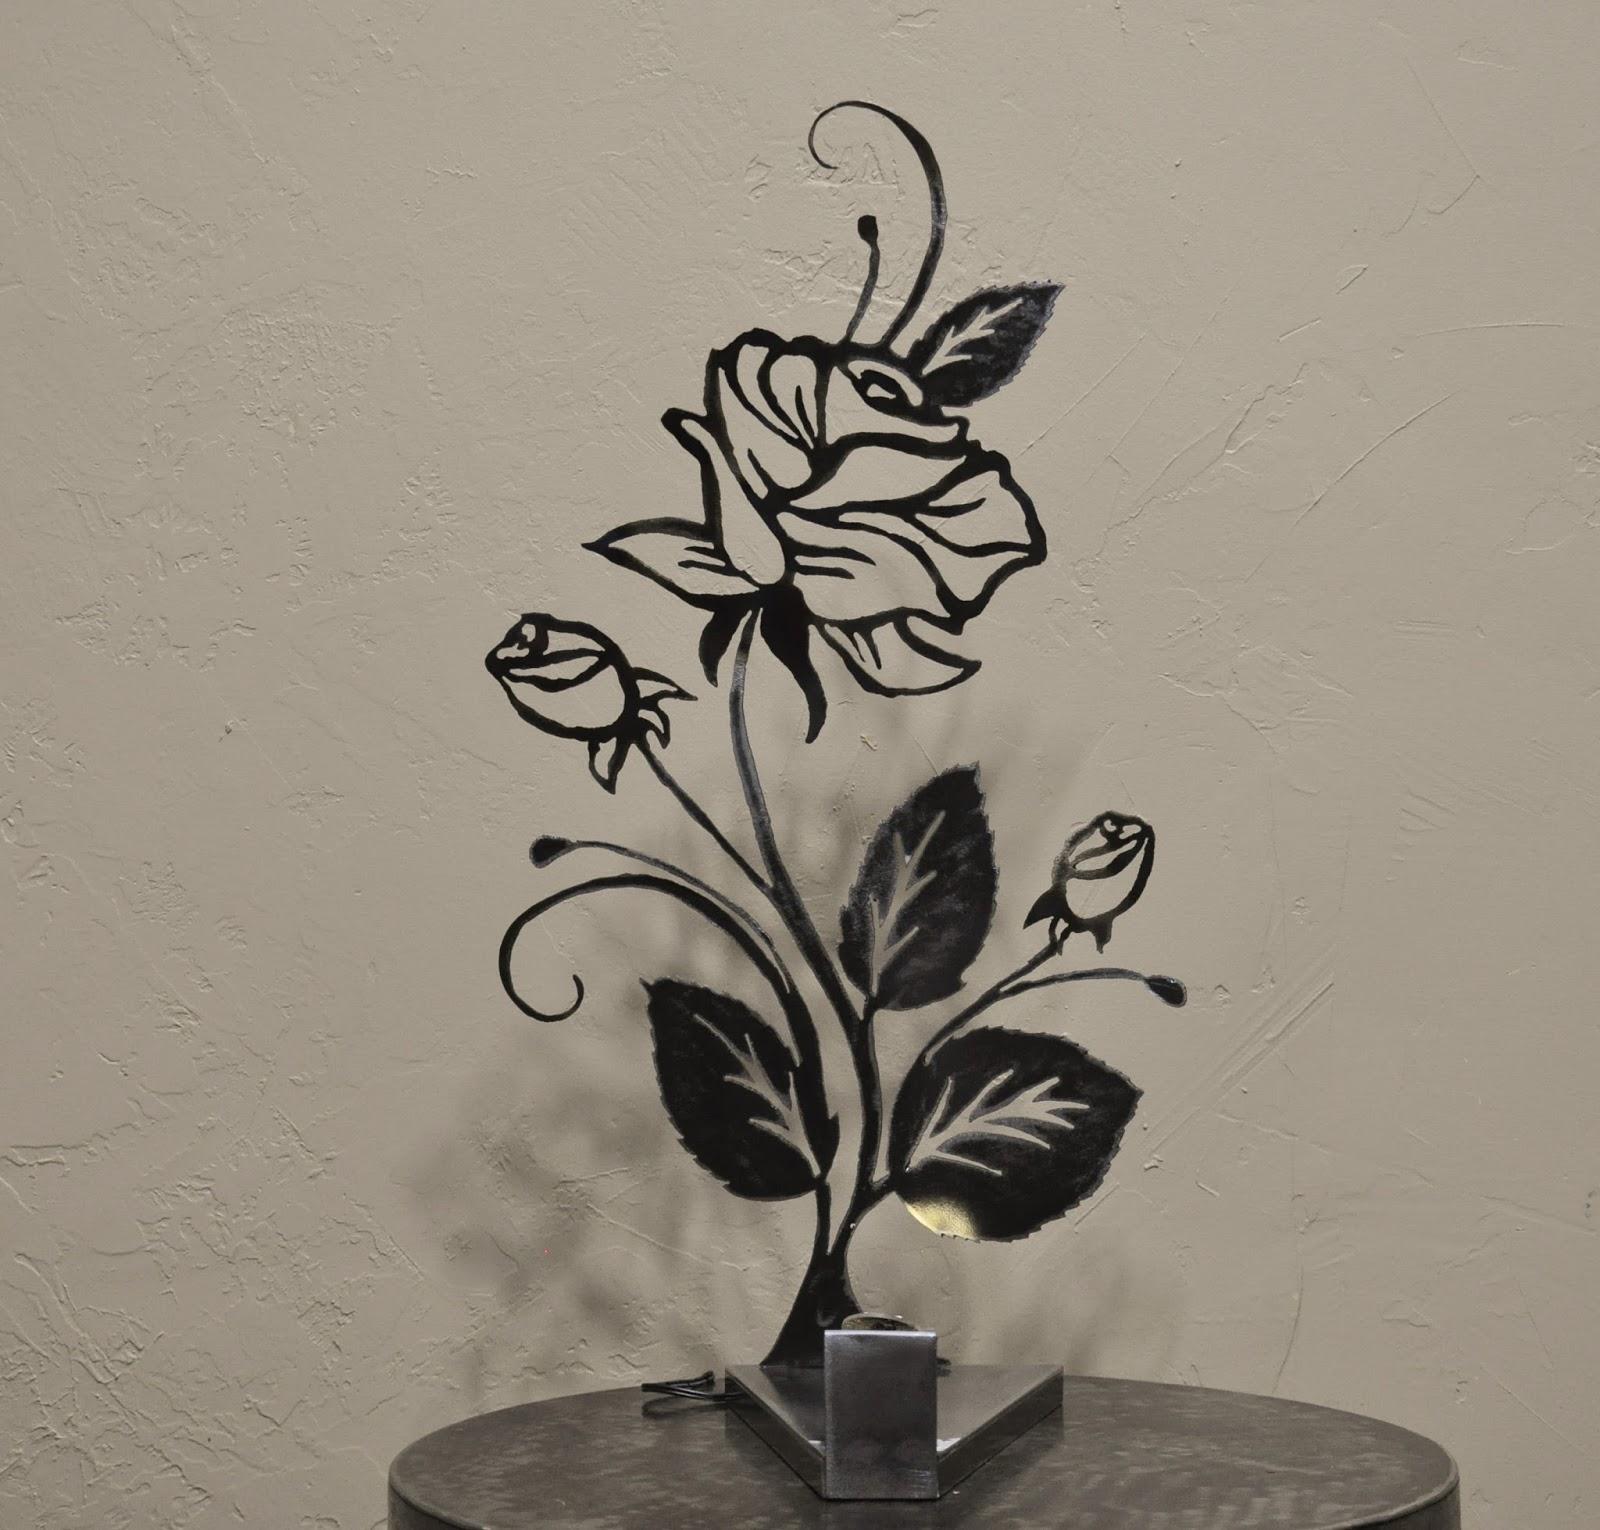 cr ateur d 39 objets d co en fer forg bougeoirs luminaires porte bouteille lampe entre ombre. Black Bedroom Furniture Sets. Home Design Ideas